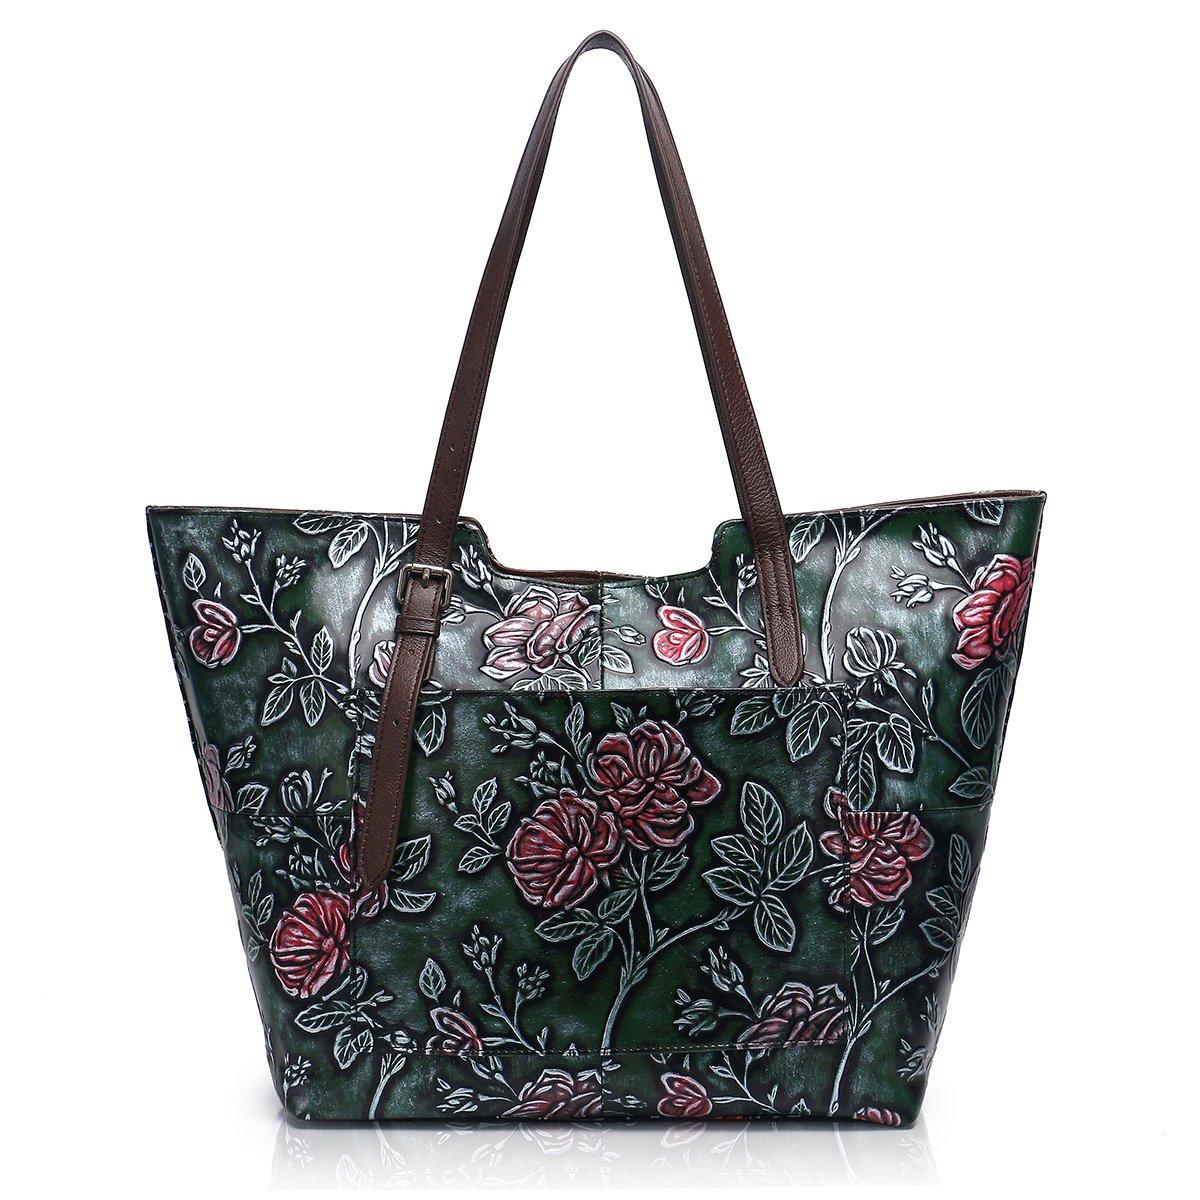 APHISON Designer Unique Embossed Floral Cowhide Leather Tote Style Ladies Top Handle Bags Handbags C812 (Green)